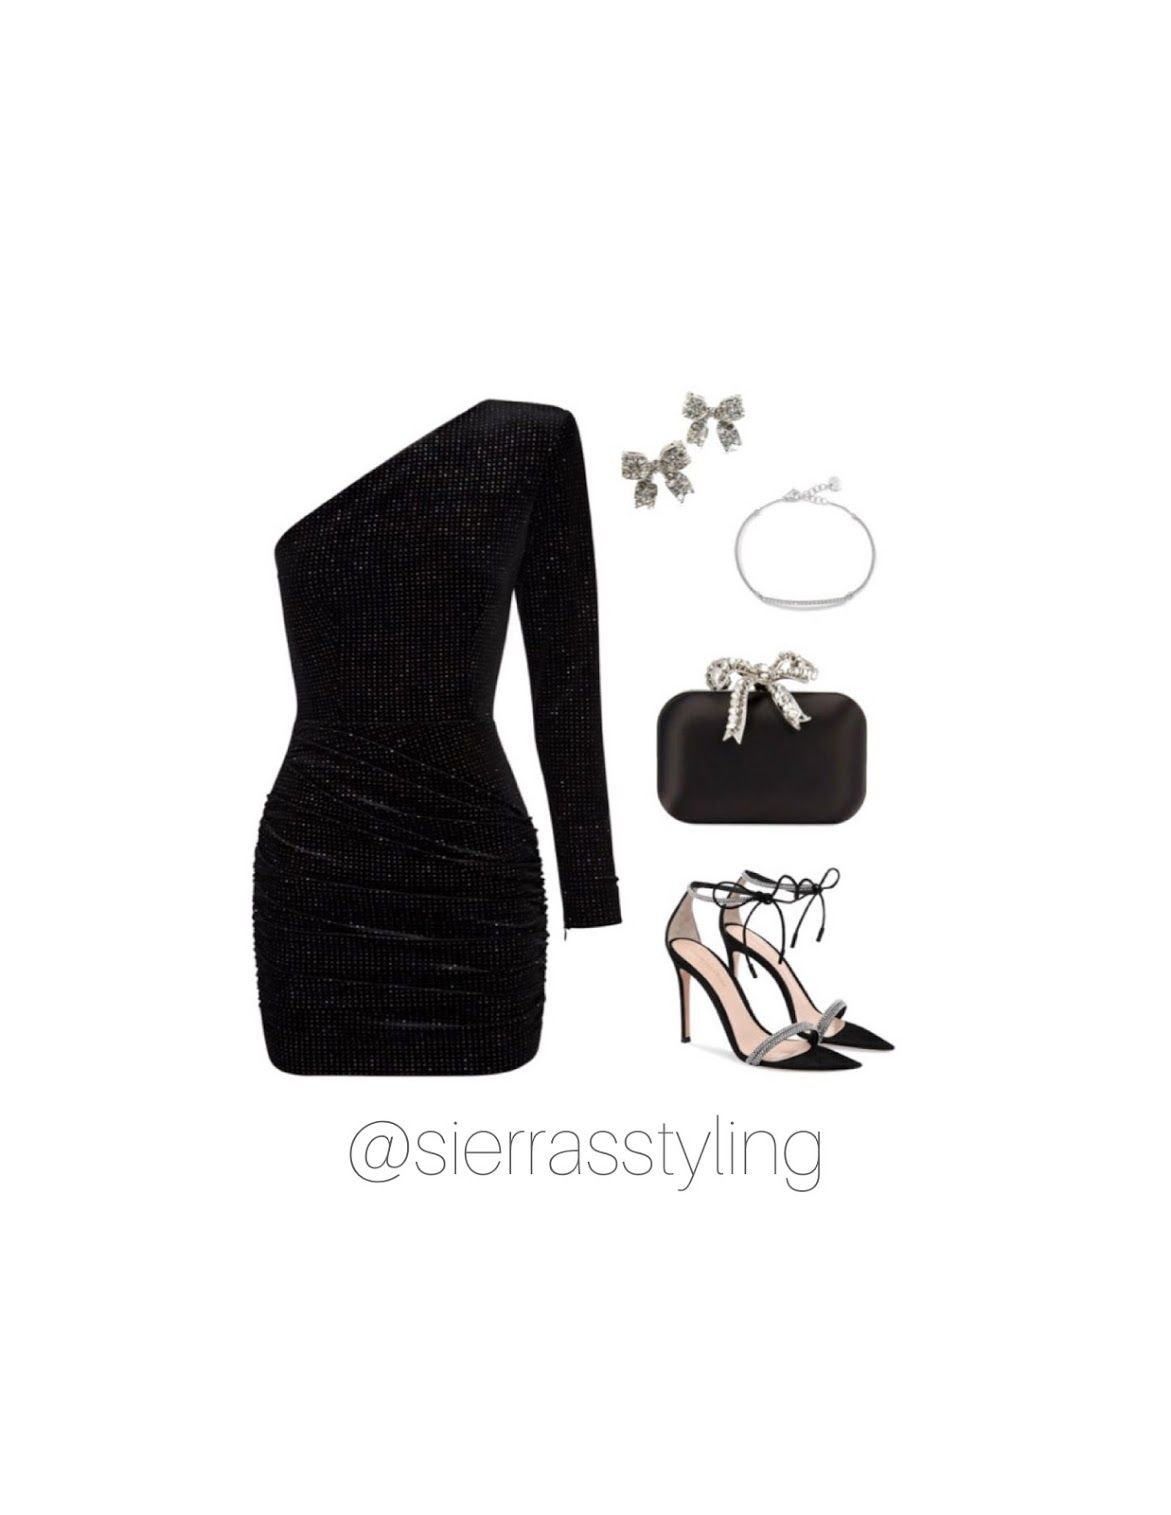 Black One Shoulder Mini Dress With Accessories Virtual Fashion Pretty Outfits Mini Dress [ 1515 x 1171 Pixel ]